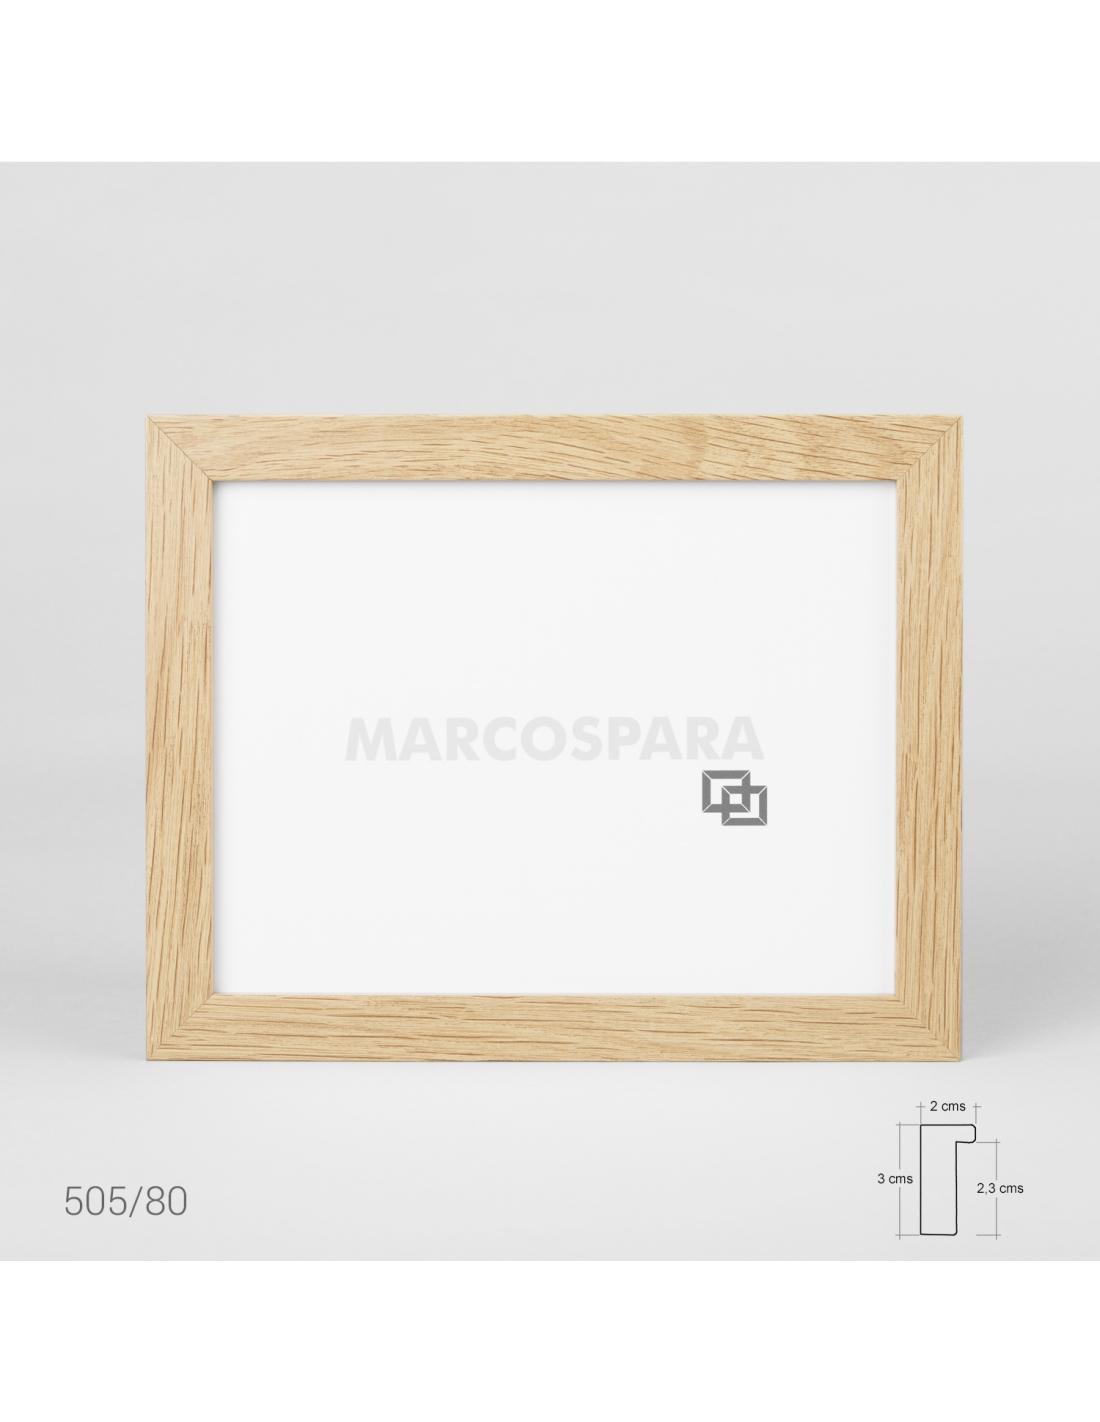 Marcos de madera para Puzzles M505